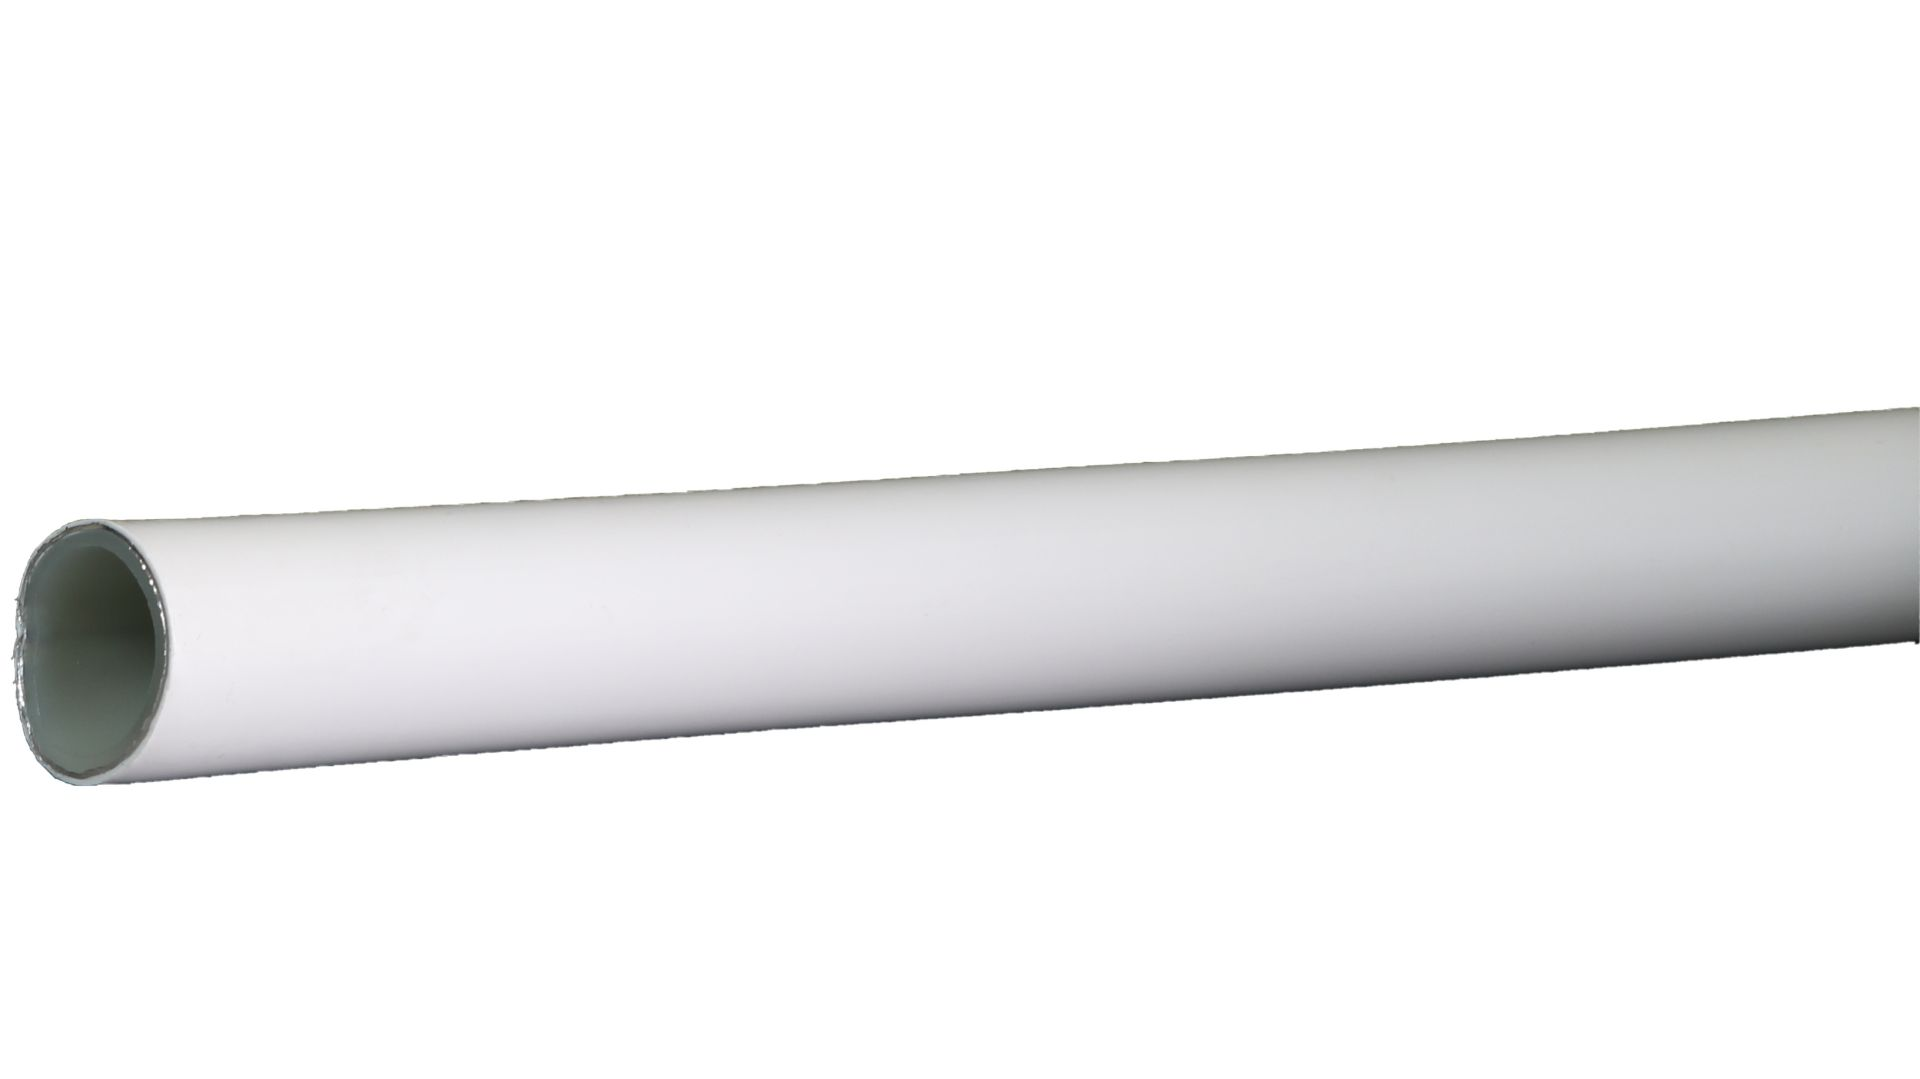 Marley AquaStec (TW) Alu-Verbundrohr 20 x 2 mm, 25 m